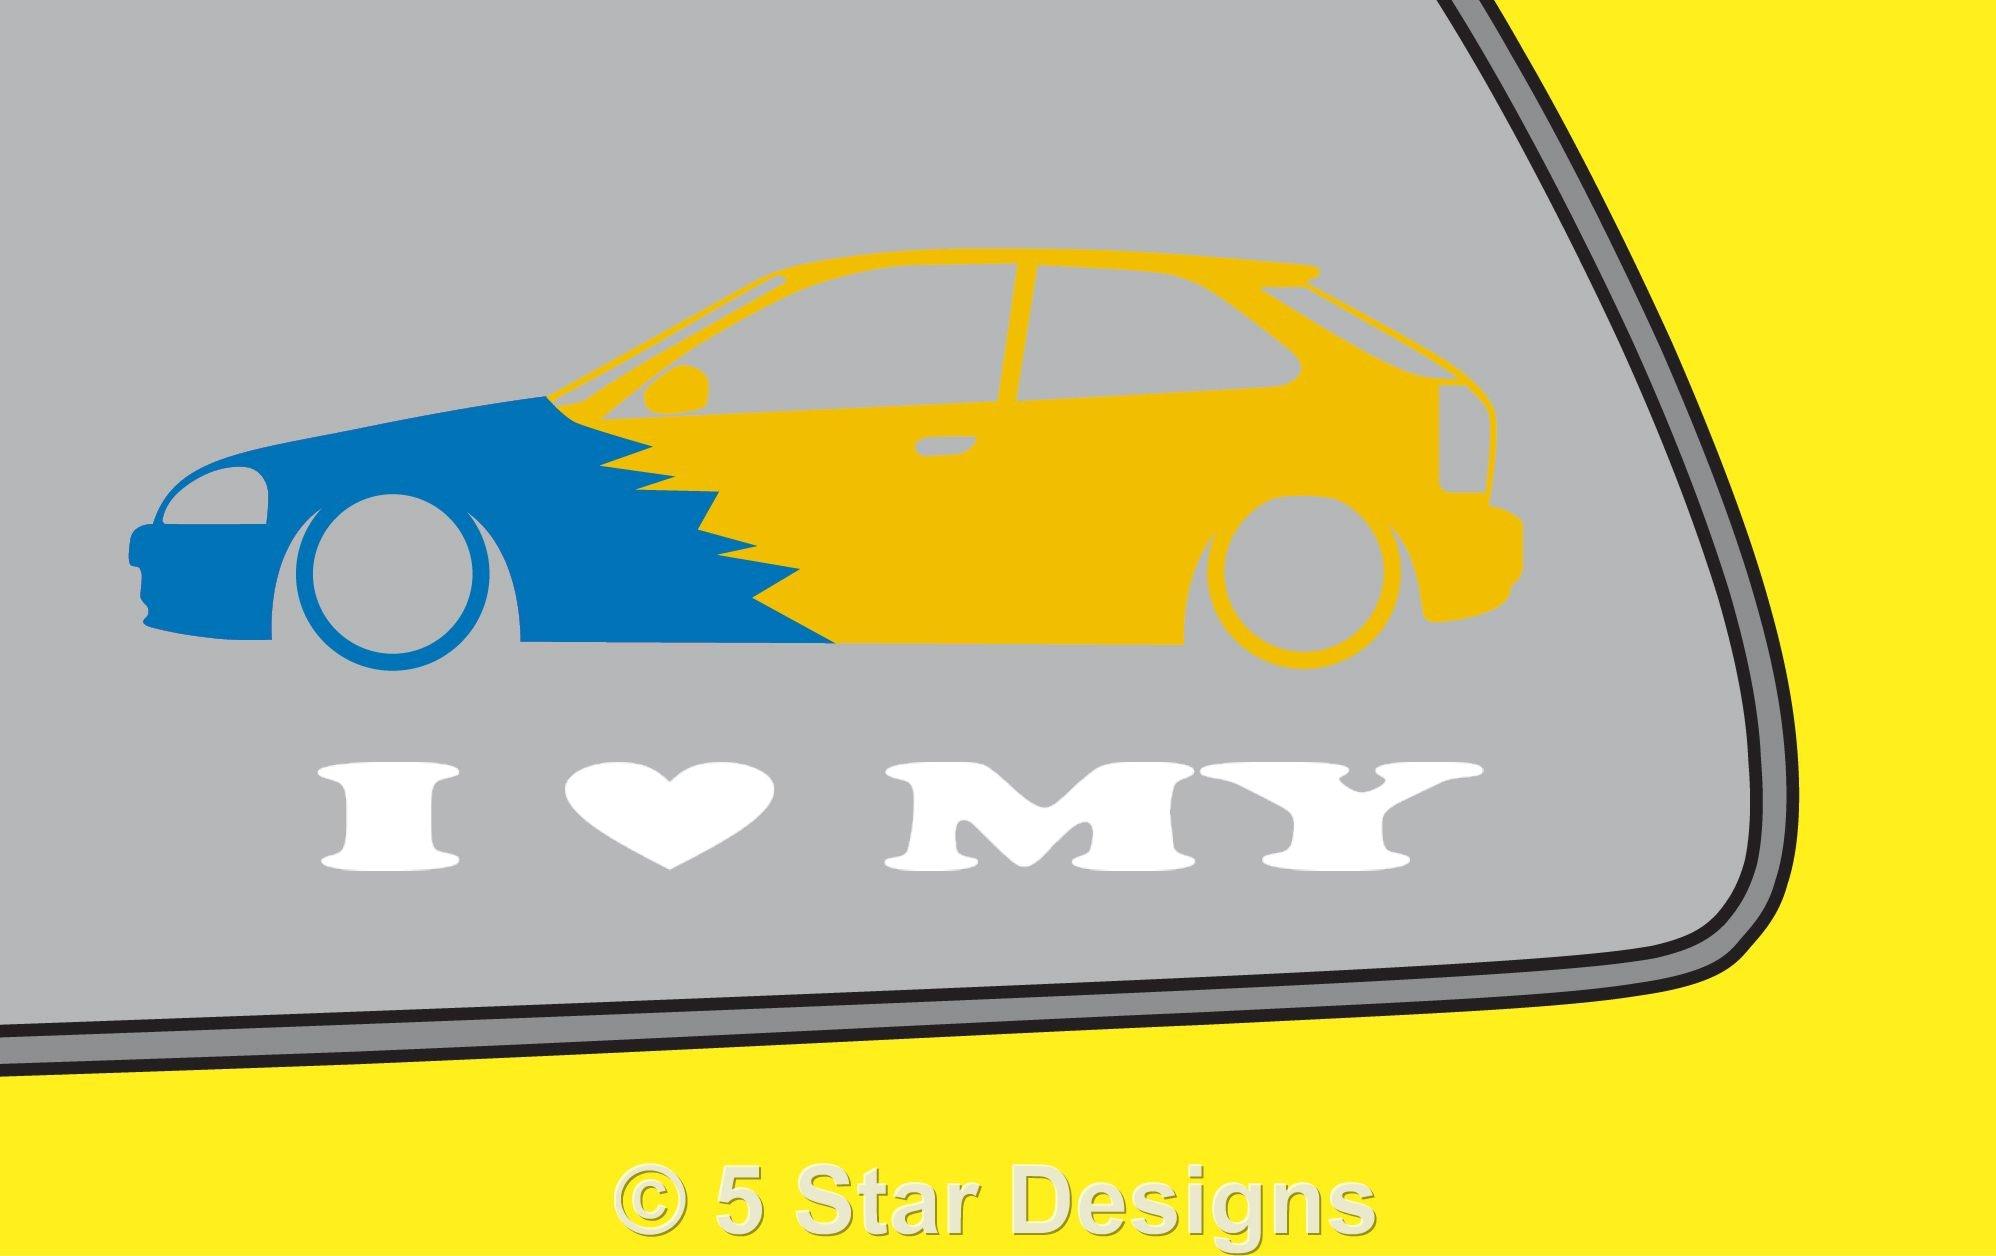 1996x1256 2x Love Low Honda Civic Ek Jdm Spoon Type R Silhouette Outline